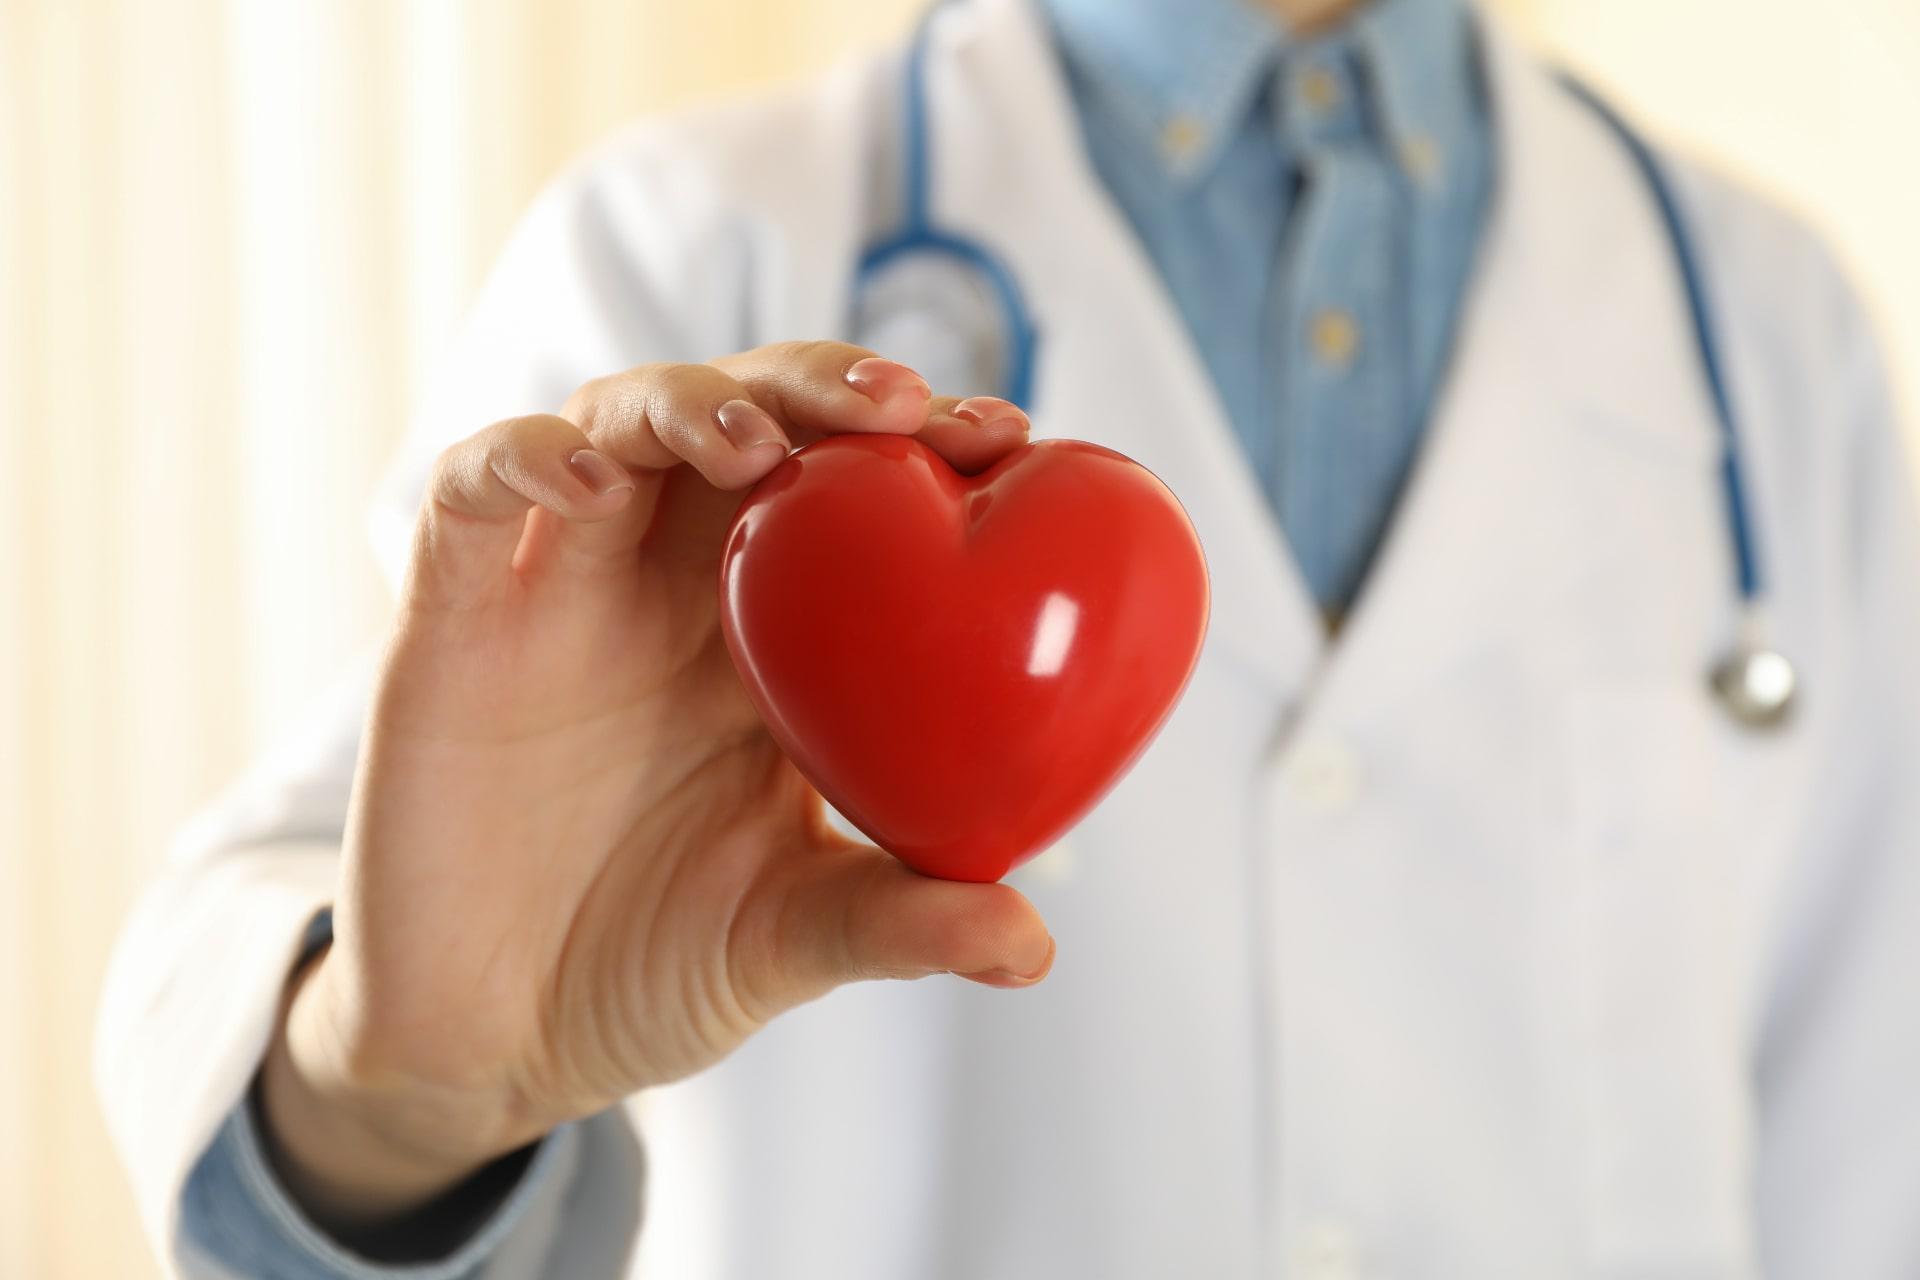 Brugnoni-group-sanita-cardiologia-tc-cuore